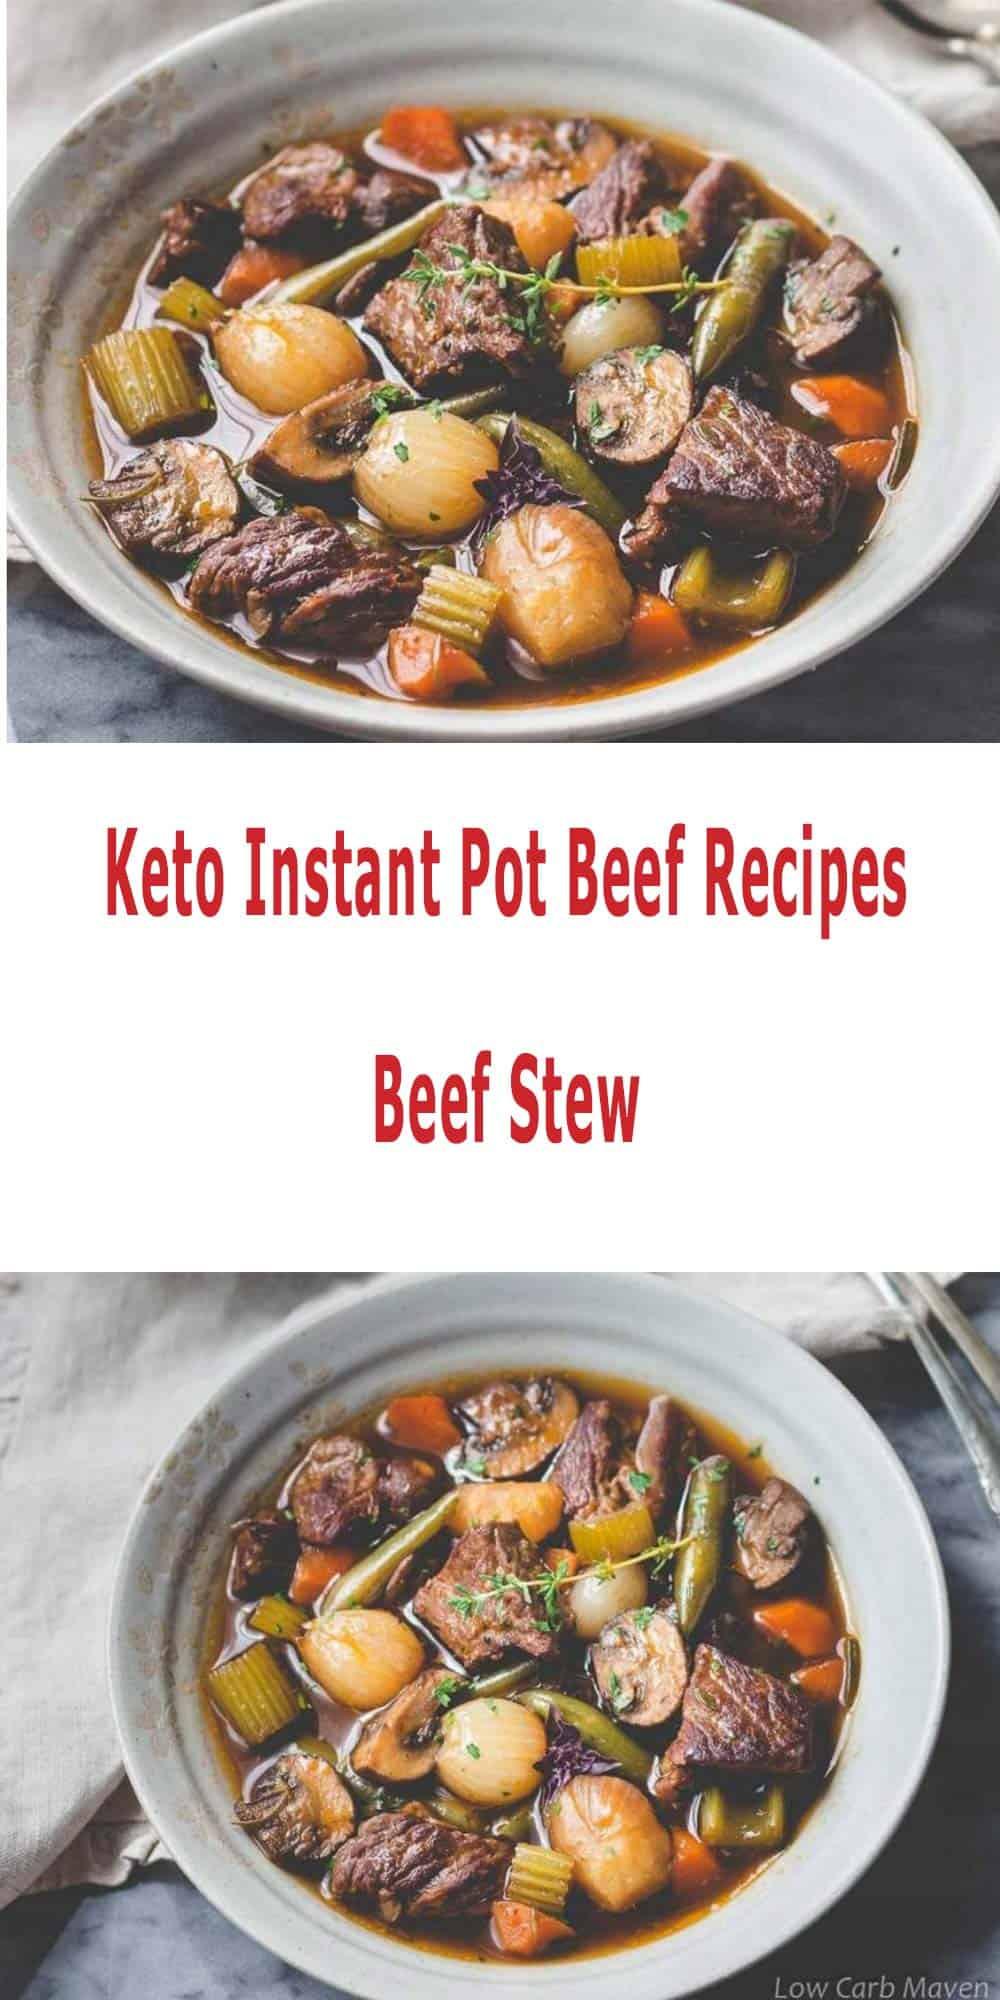 Instant Pot Beef Keto  keto instant pot beef recipes beef stew Keto Wiz